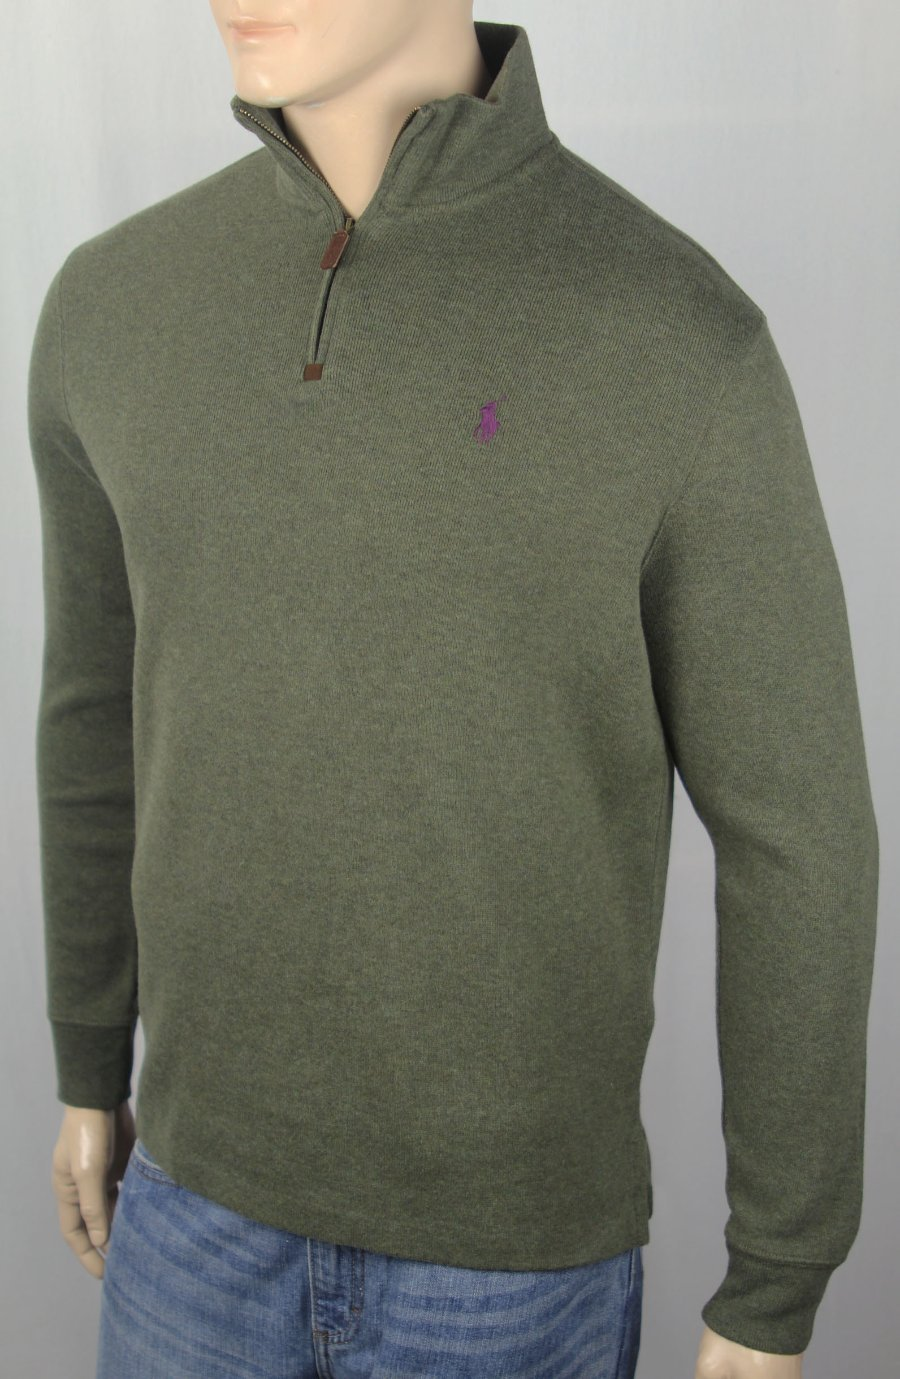 Ralph Details Sweater Pony Olive Green Polo Zip 12 Lauren Nwt About Plum Half TlFJ15uKc3